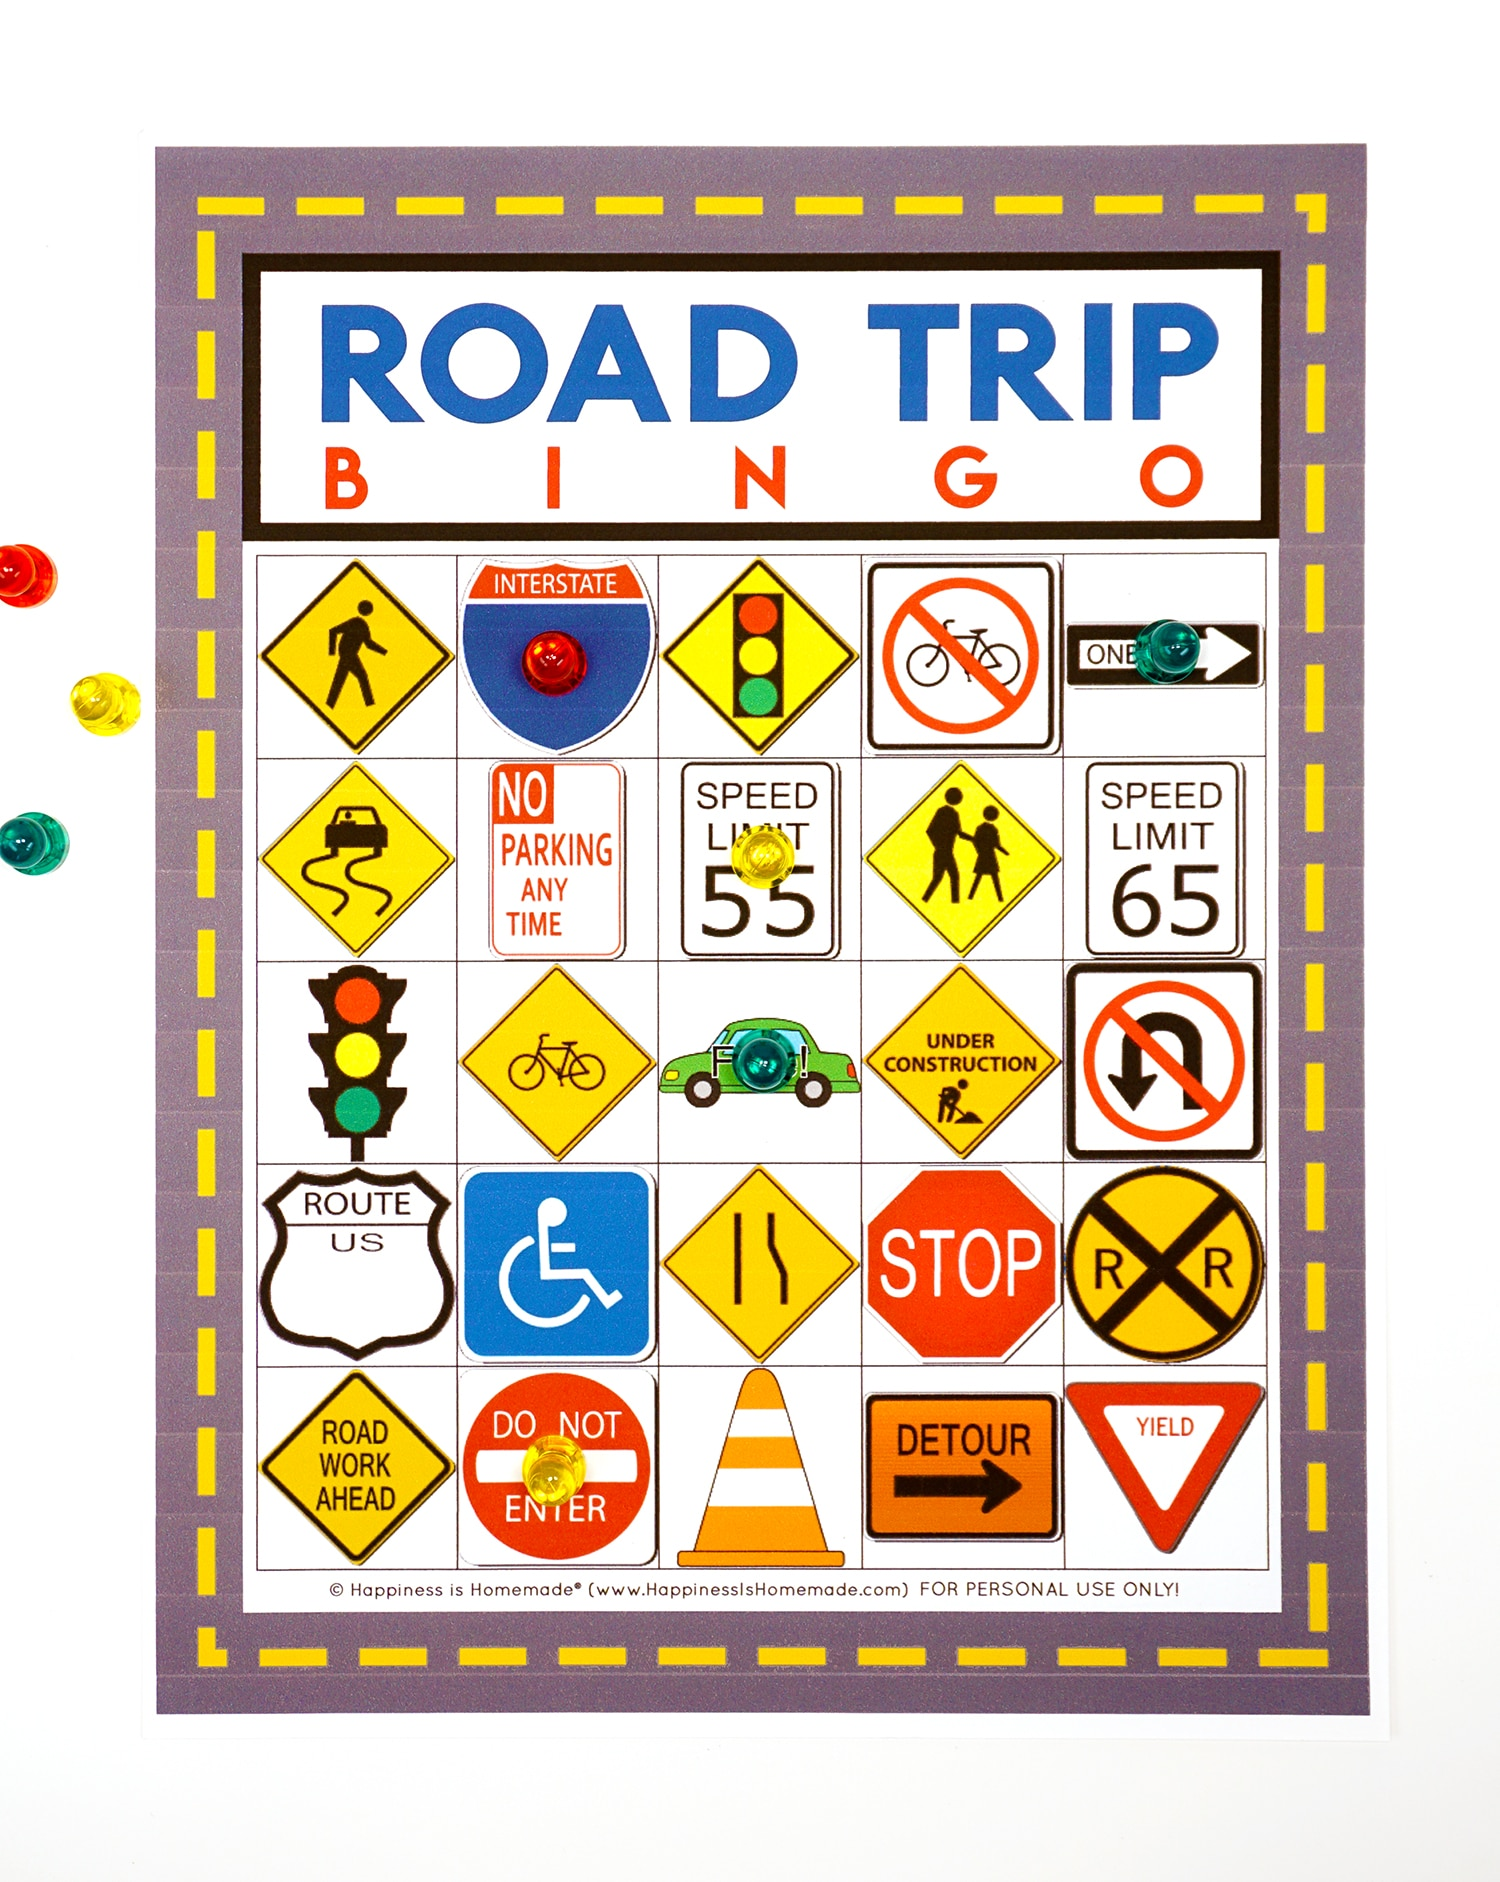 Road Trip Bingo printable game card on white background